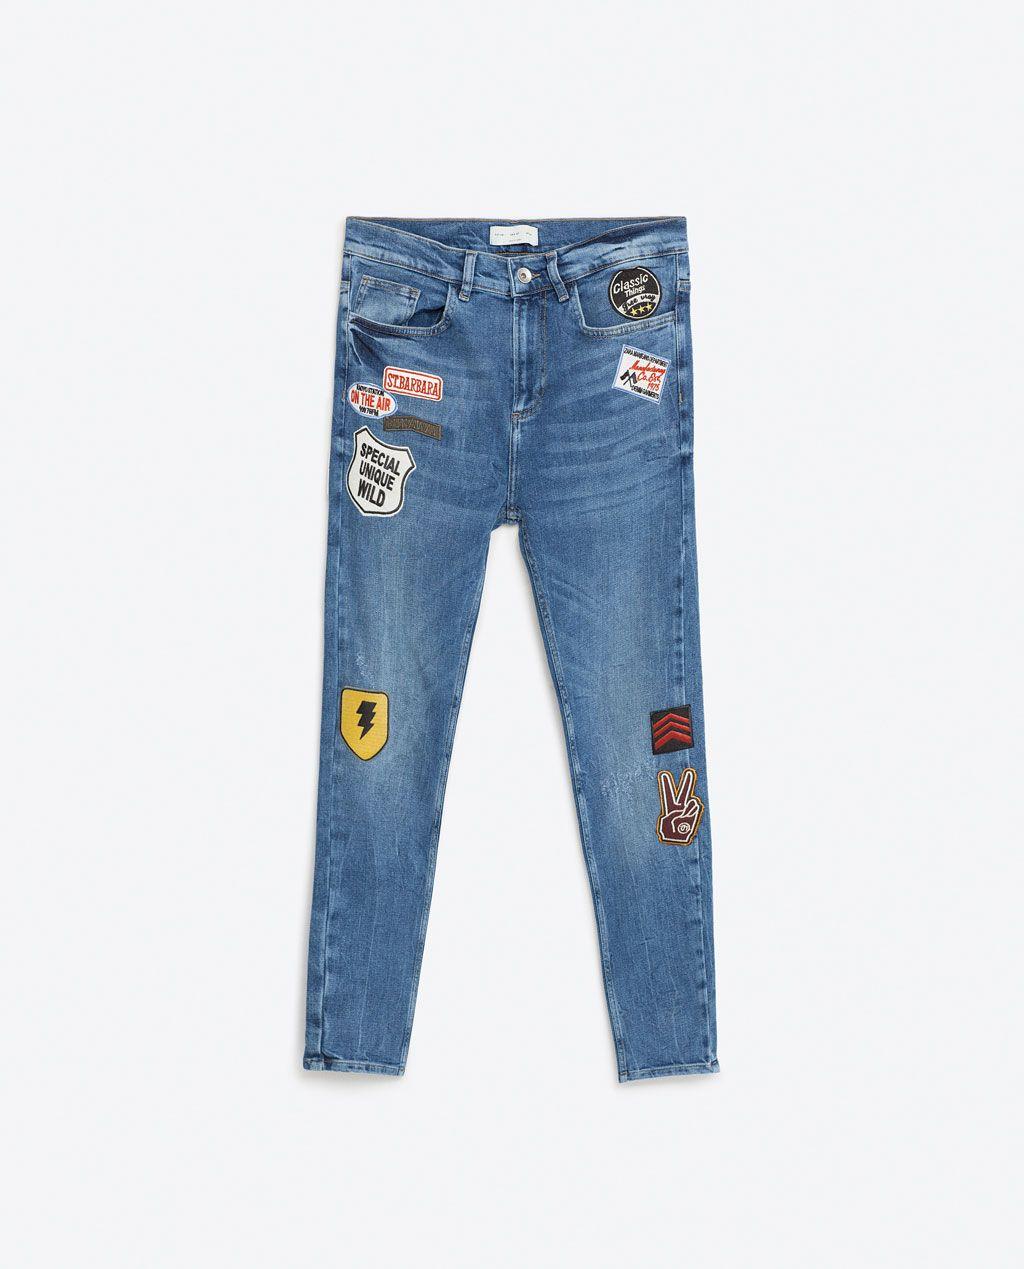 Access Denied Patched Jeans Jeans Kids Women Jeans